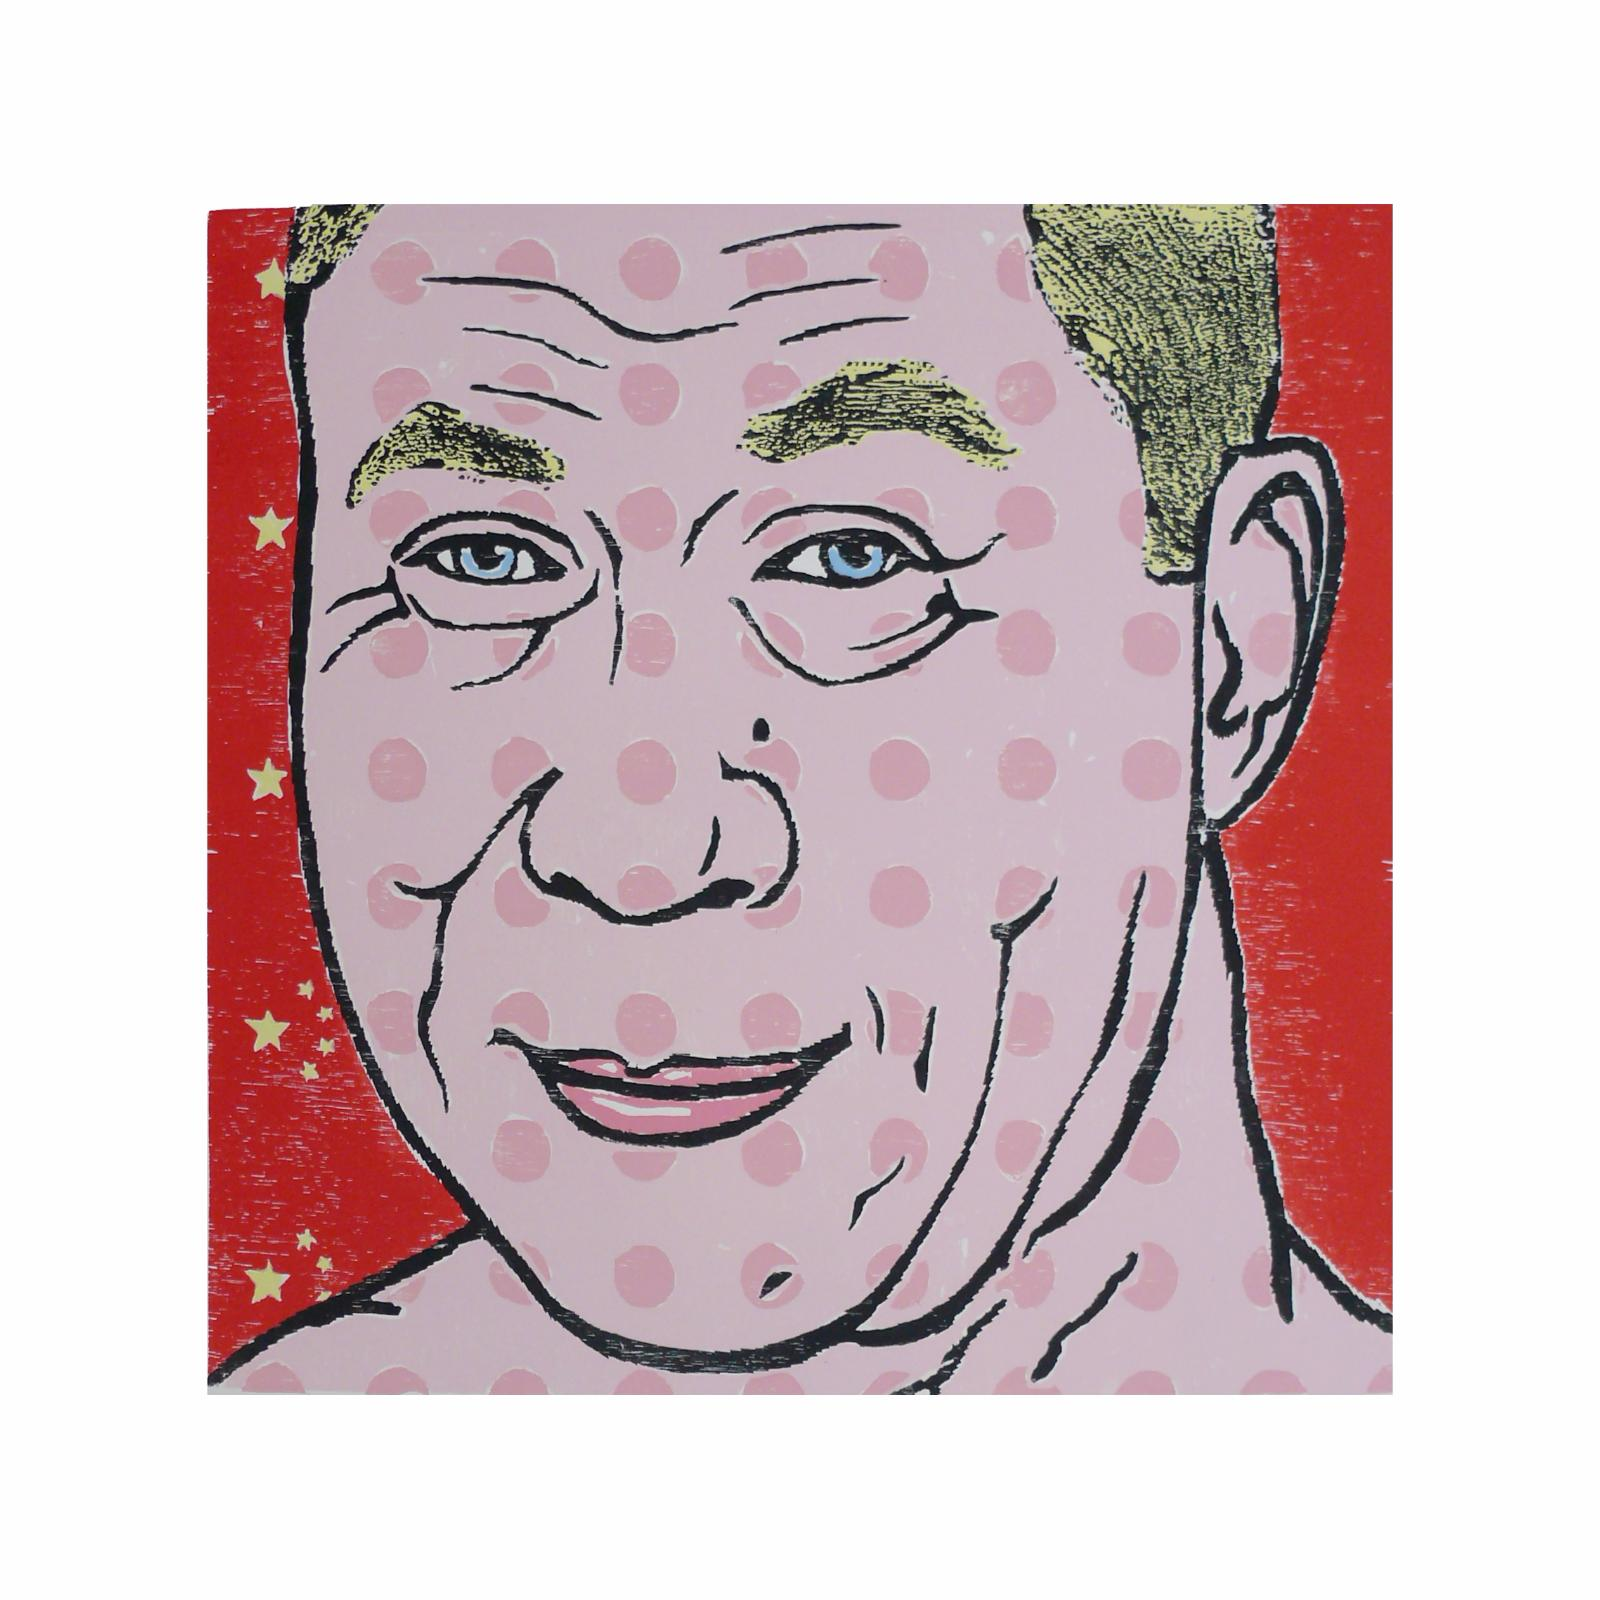 Thomas Rissler, POP 2 - 4, 2003, Holzschnitte 5-8 Farben, Papierformat 70 cm x 70 cm, geringe Stückzahl